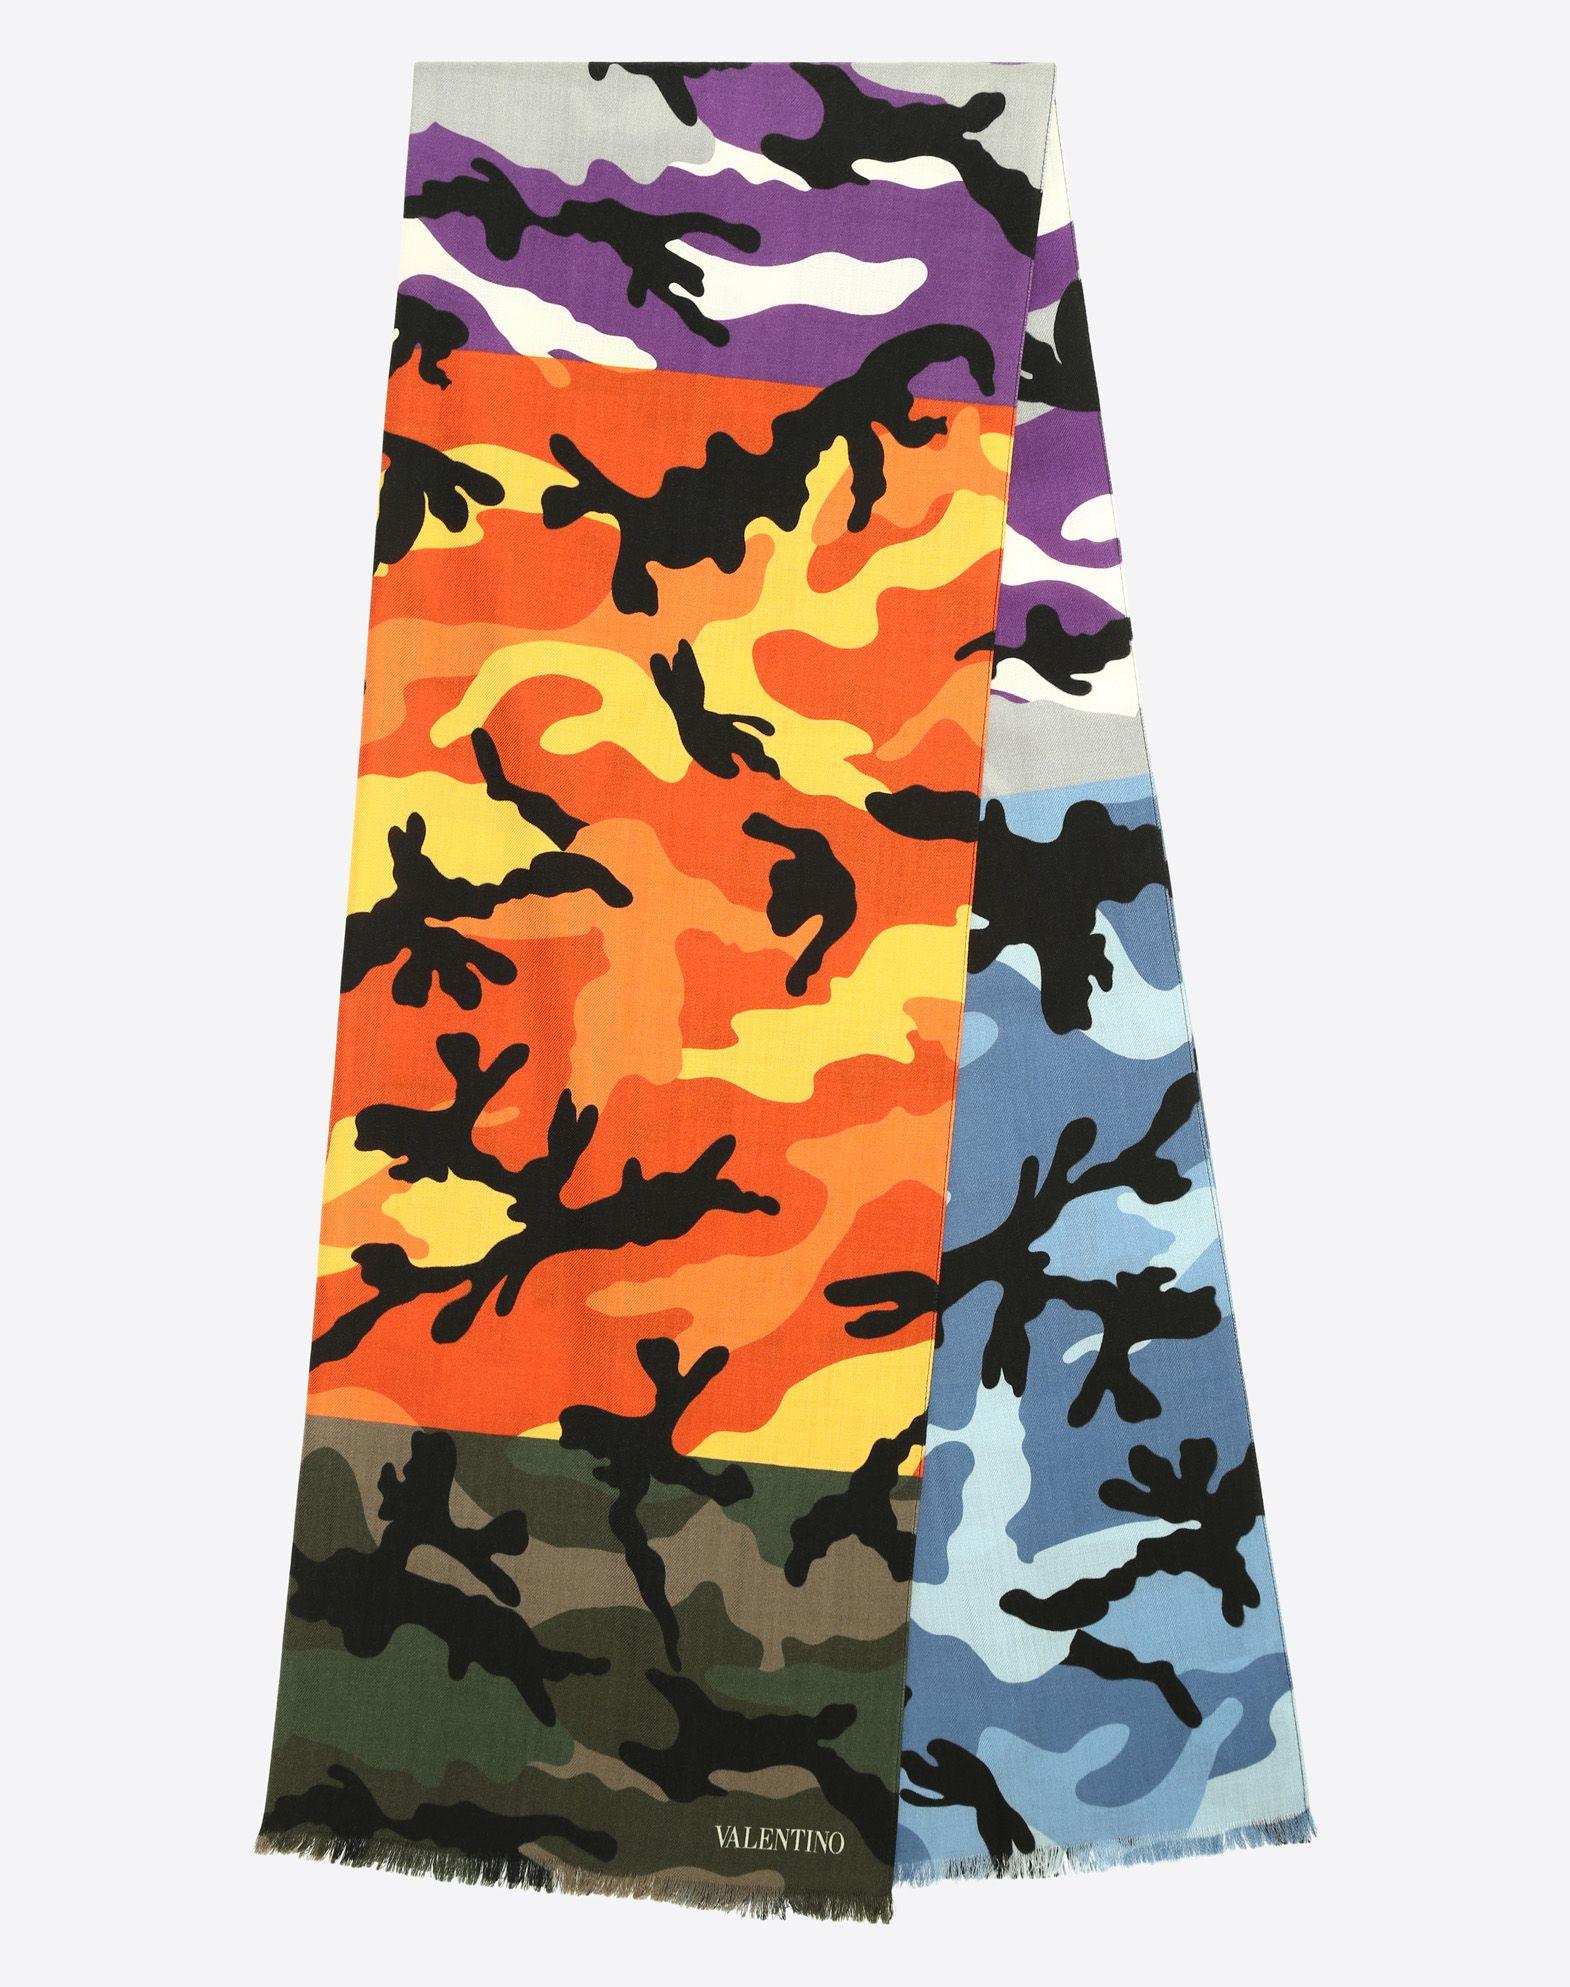 VALENTINO UOMO 70x200 cm Camouflage scarf      Shawl U r